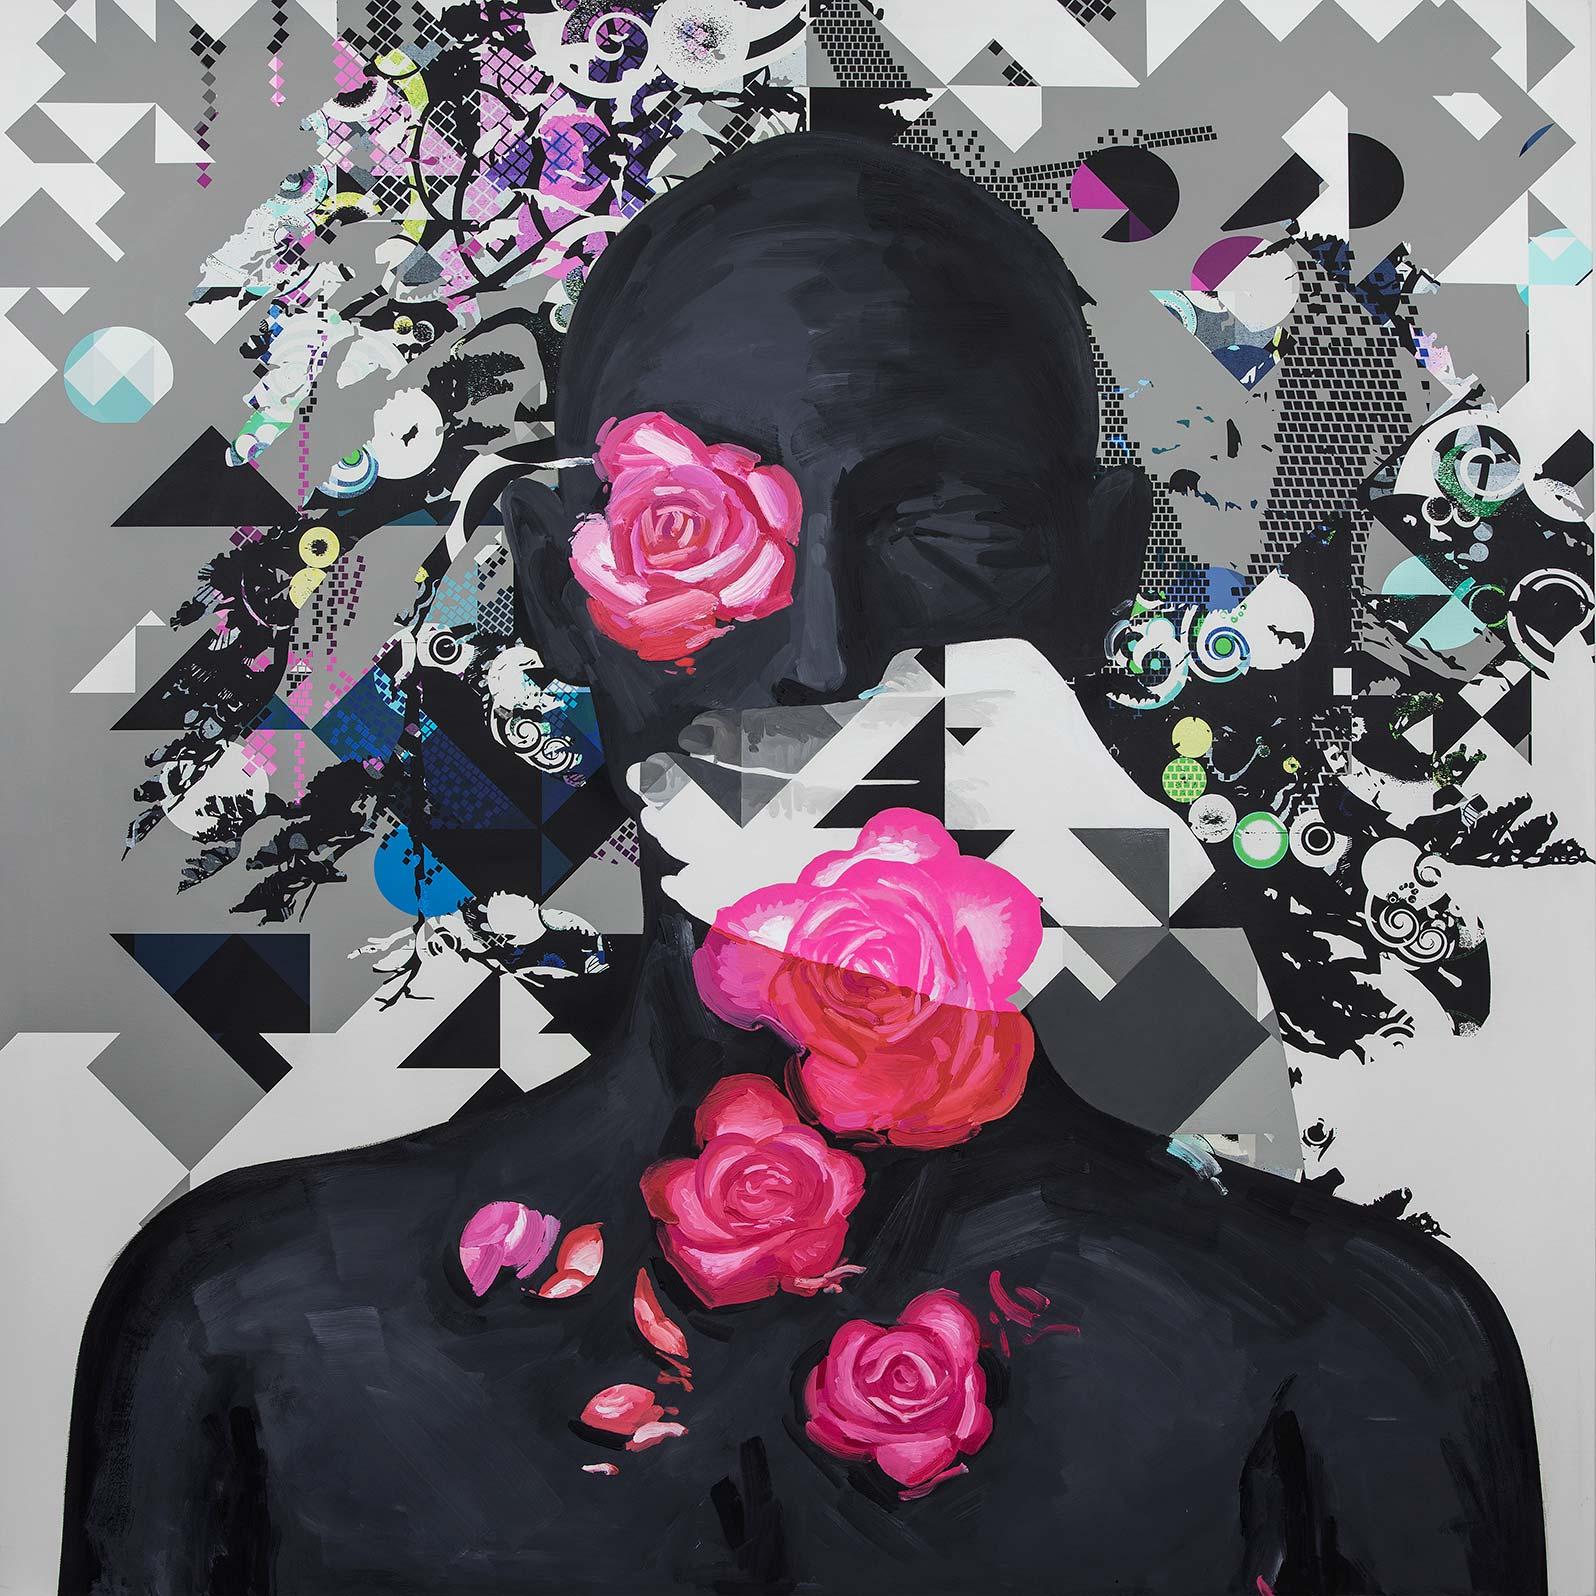 Anca Stefanescu | Mixed Media | ASilentFragment, Modern Art Paintings